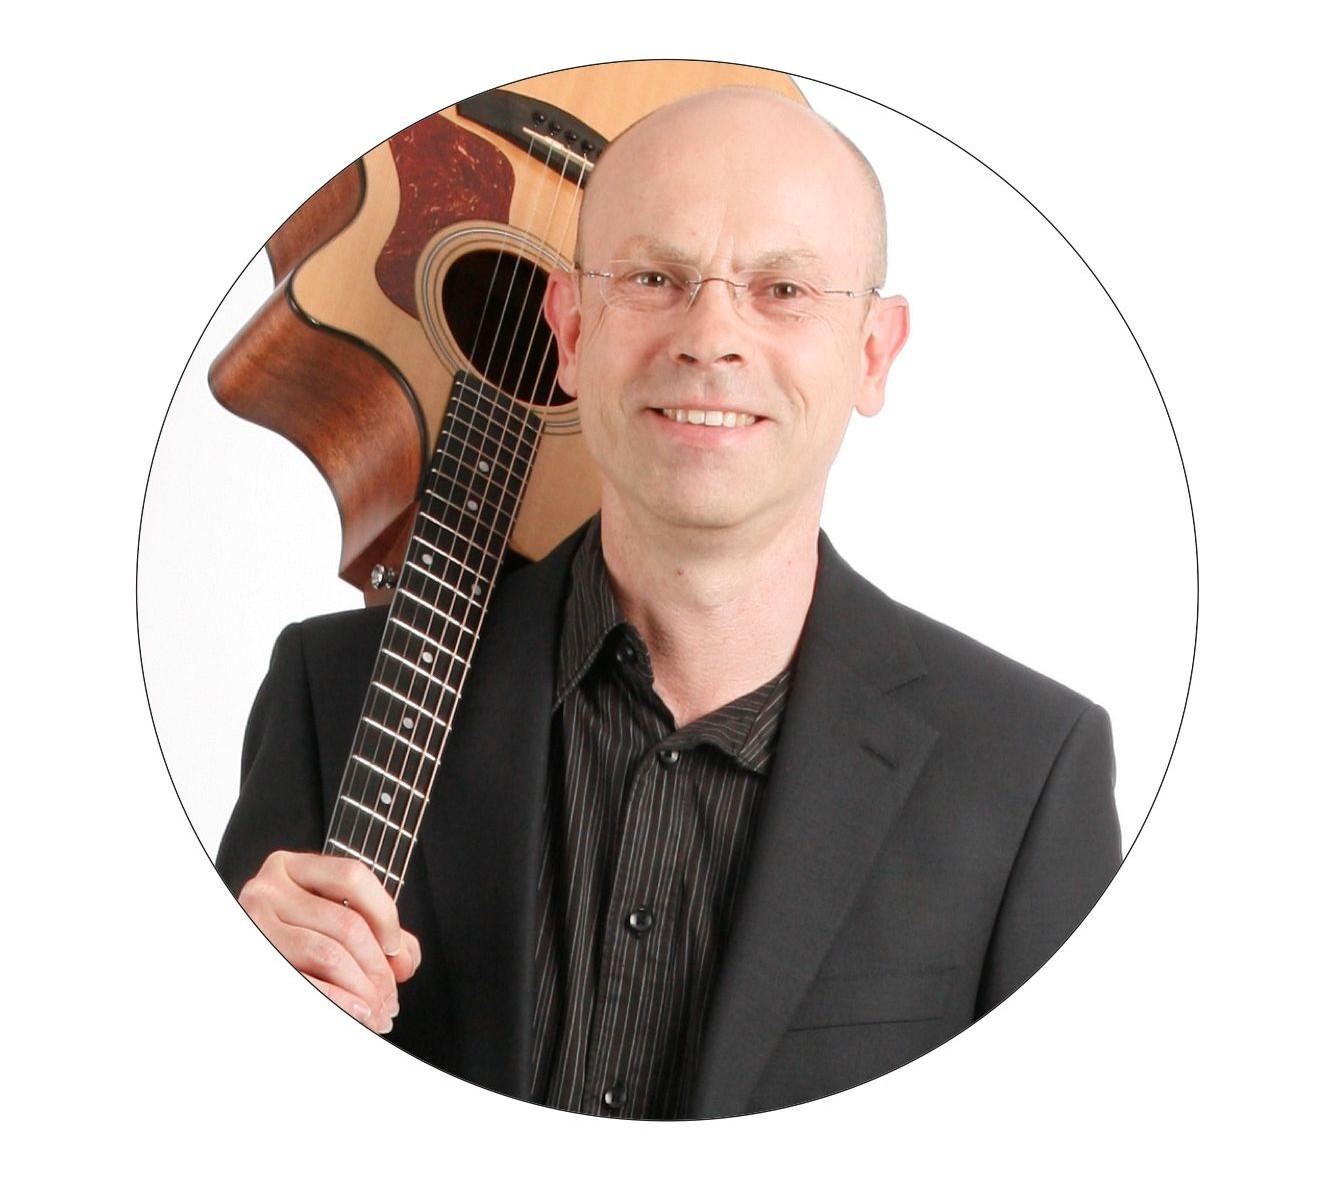 Michael Schmolke, Gitarrist, Musikpaedagoge, Autor